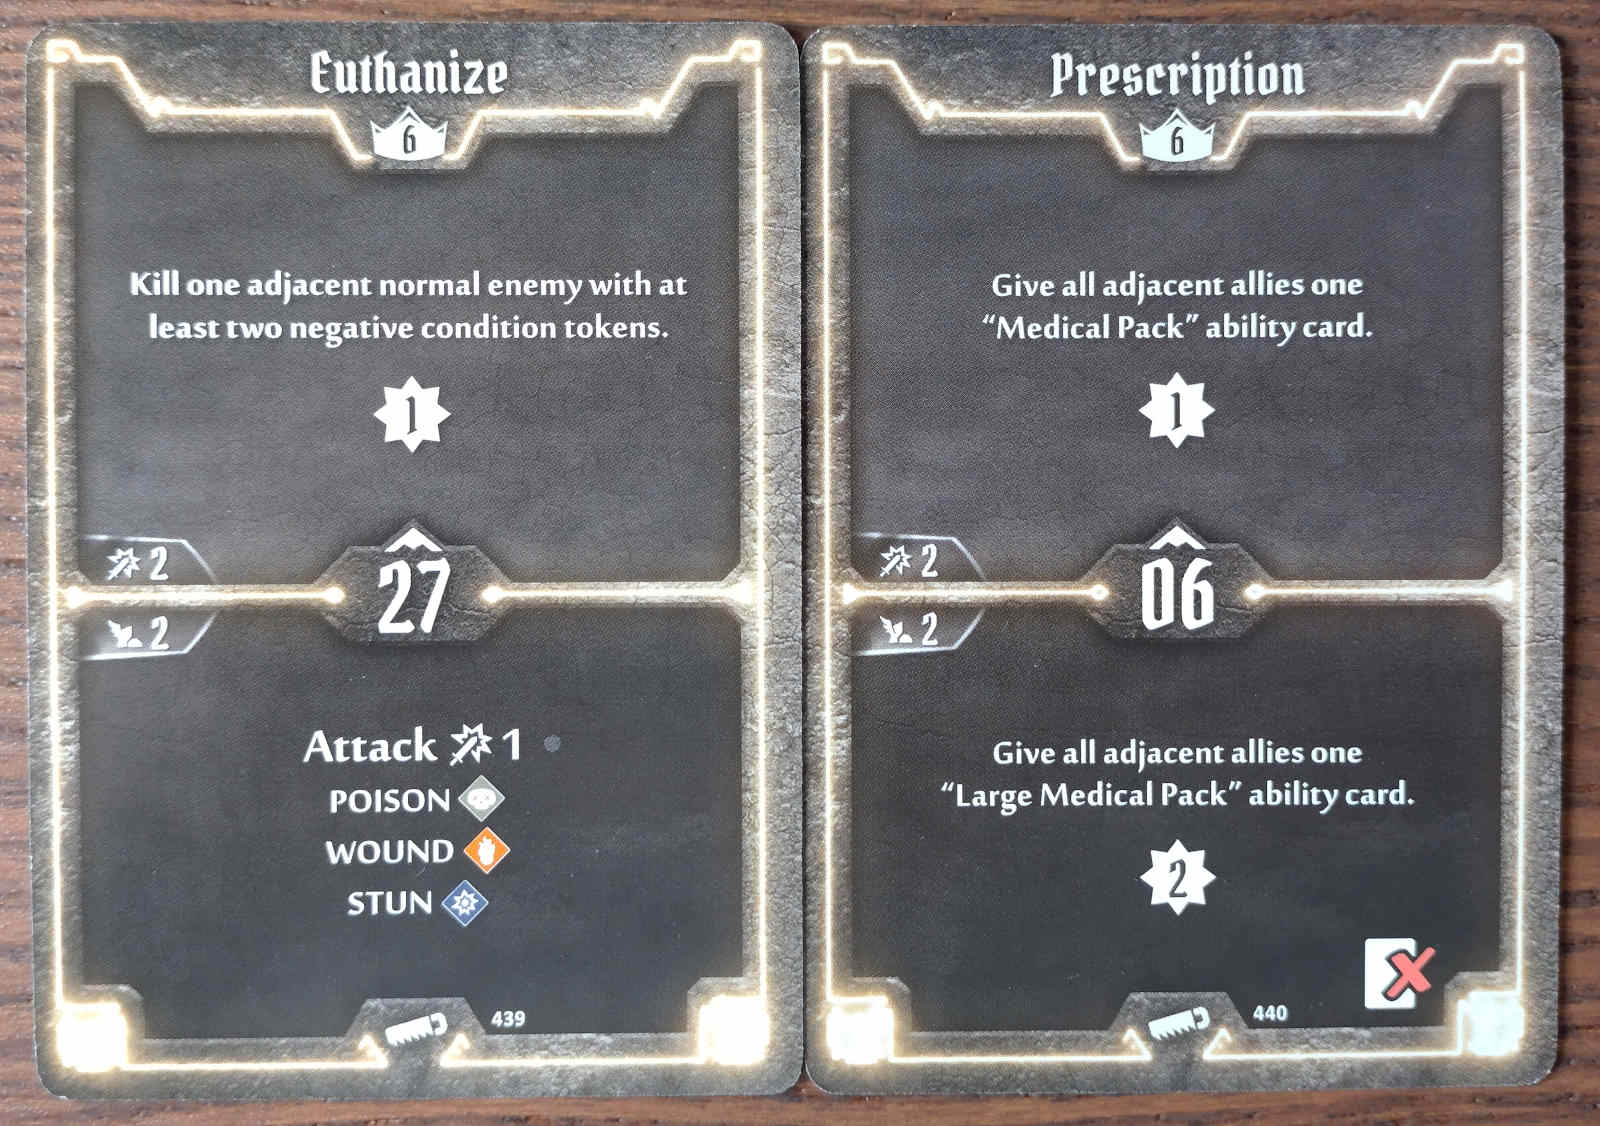 Level 6 Sawbones cards - Euthanize and Prescription